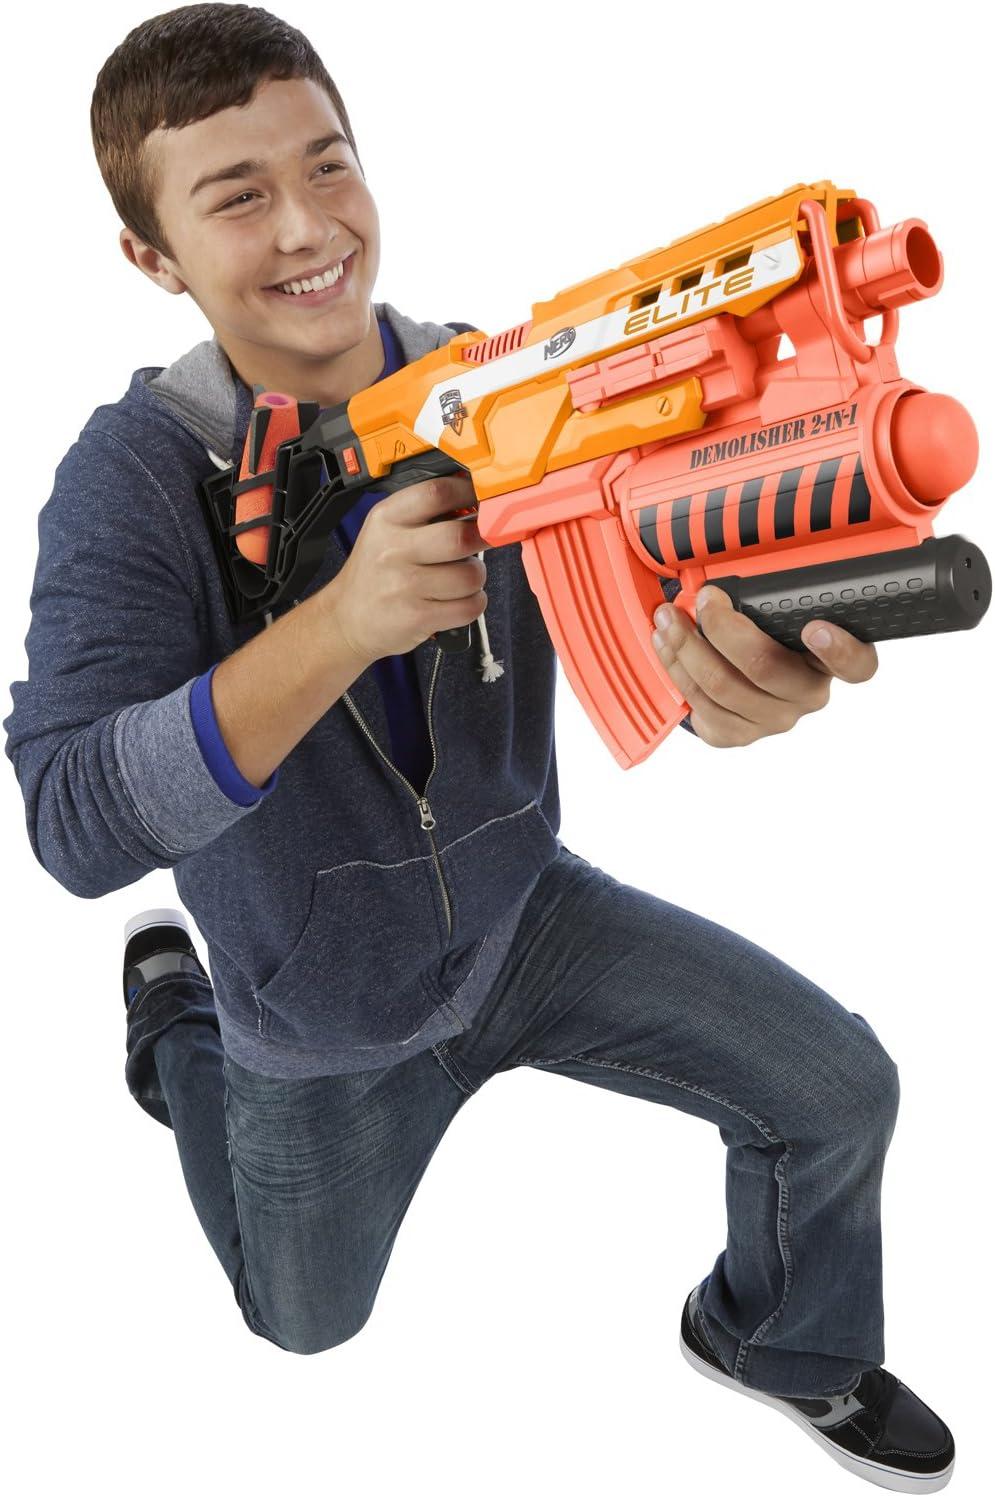 MISSILI morbido per pistola Nerf N Strike Launcher DEMOLISHER Blaster Bambini Giocattoli Regali